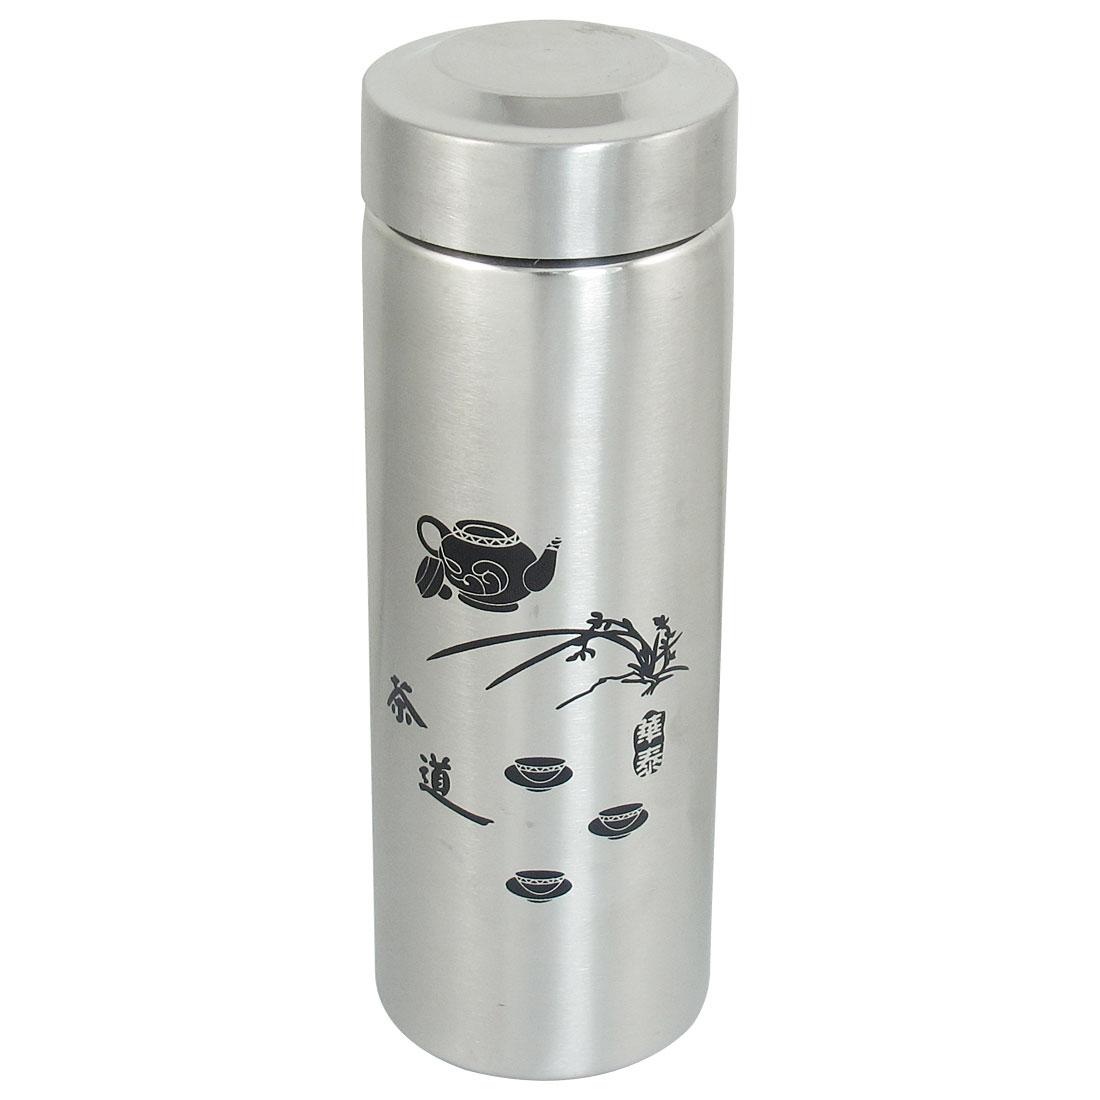 Silver Tone Stainless Steel Heat Retaining Vacuum Warm Cup Mug Bottle 420ml